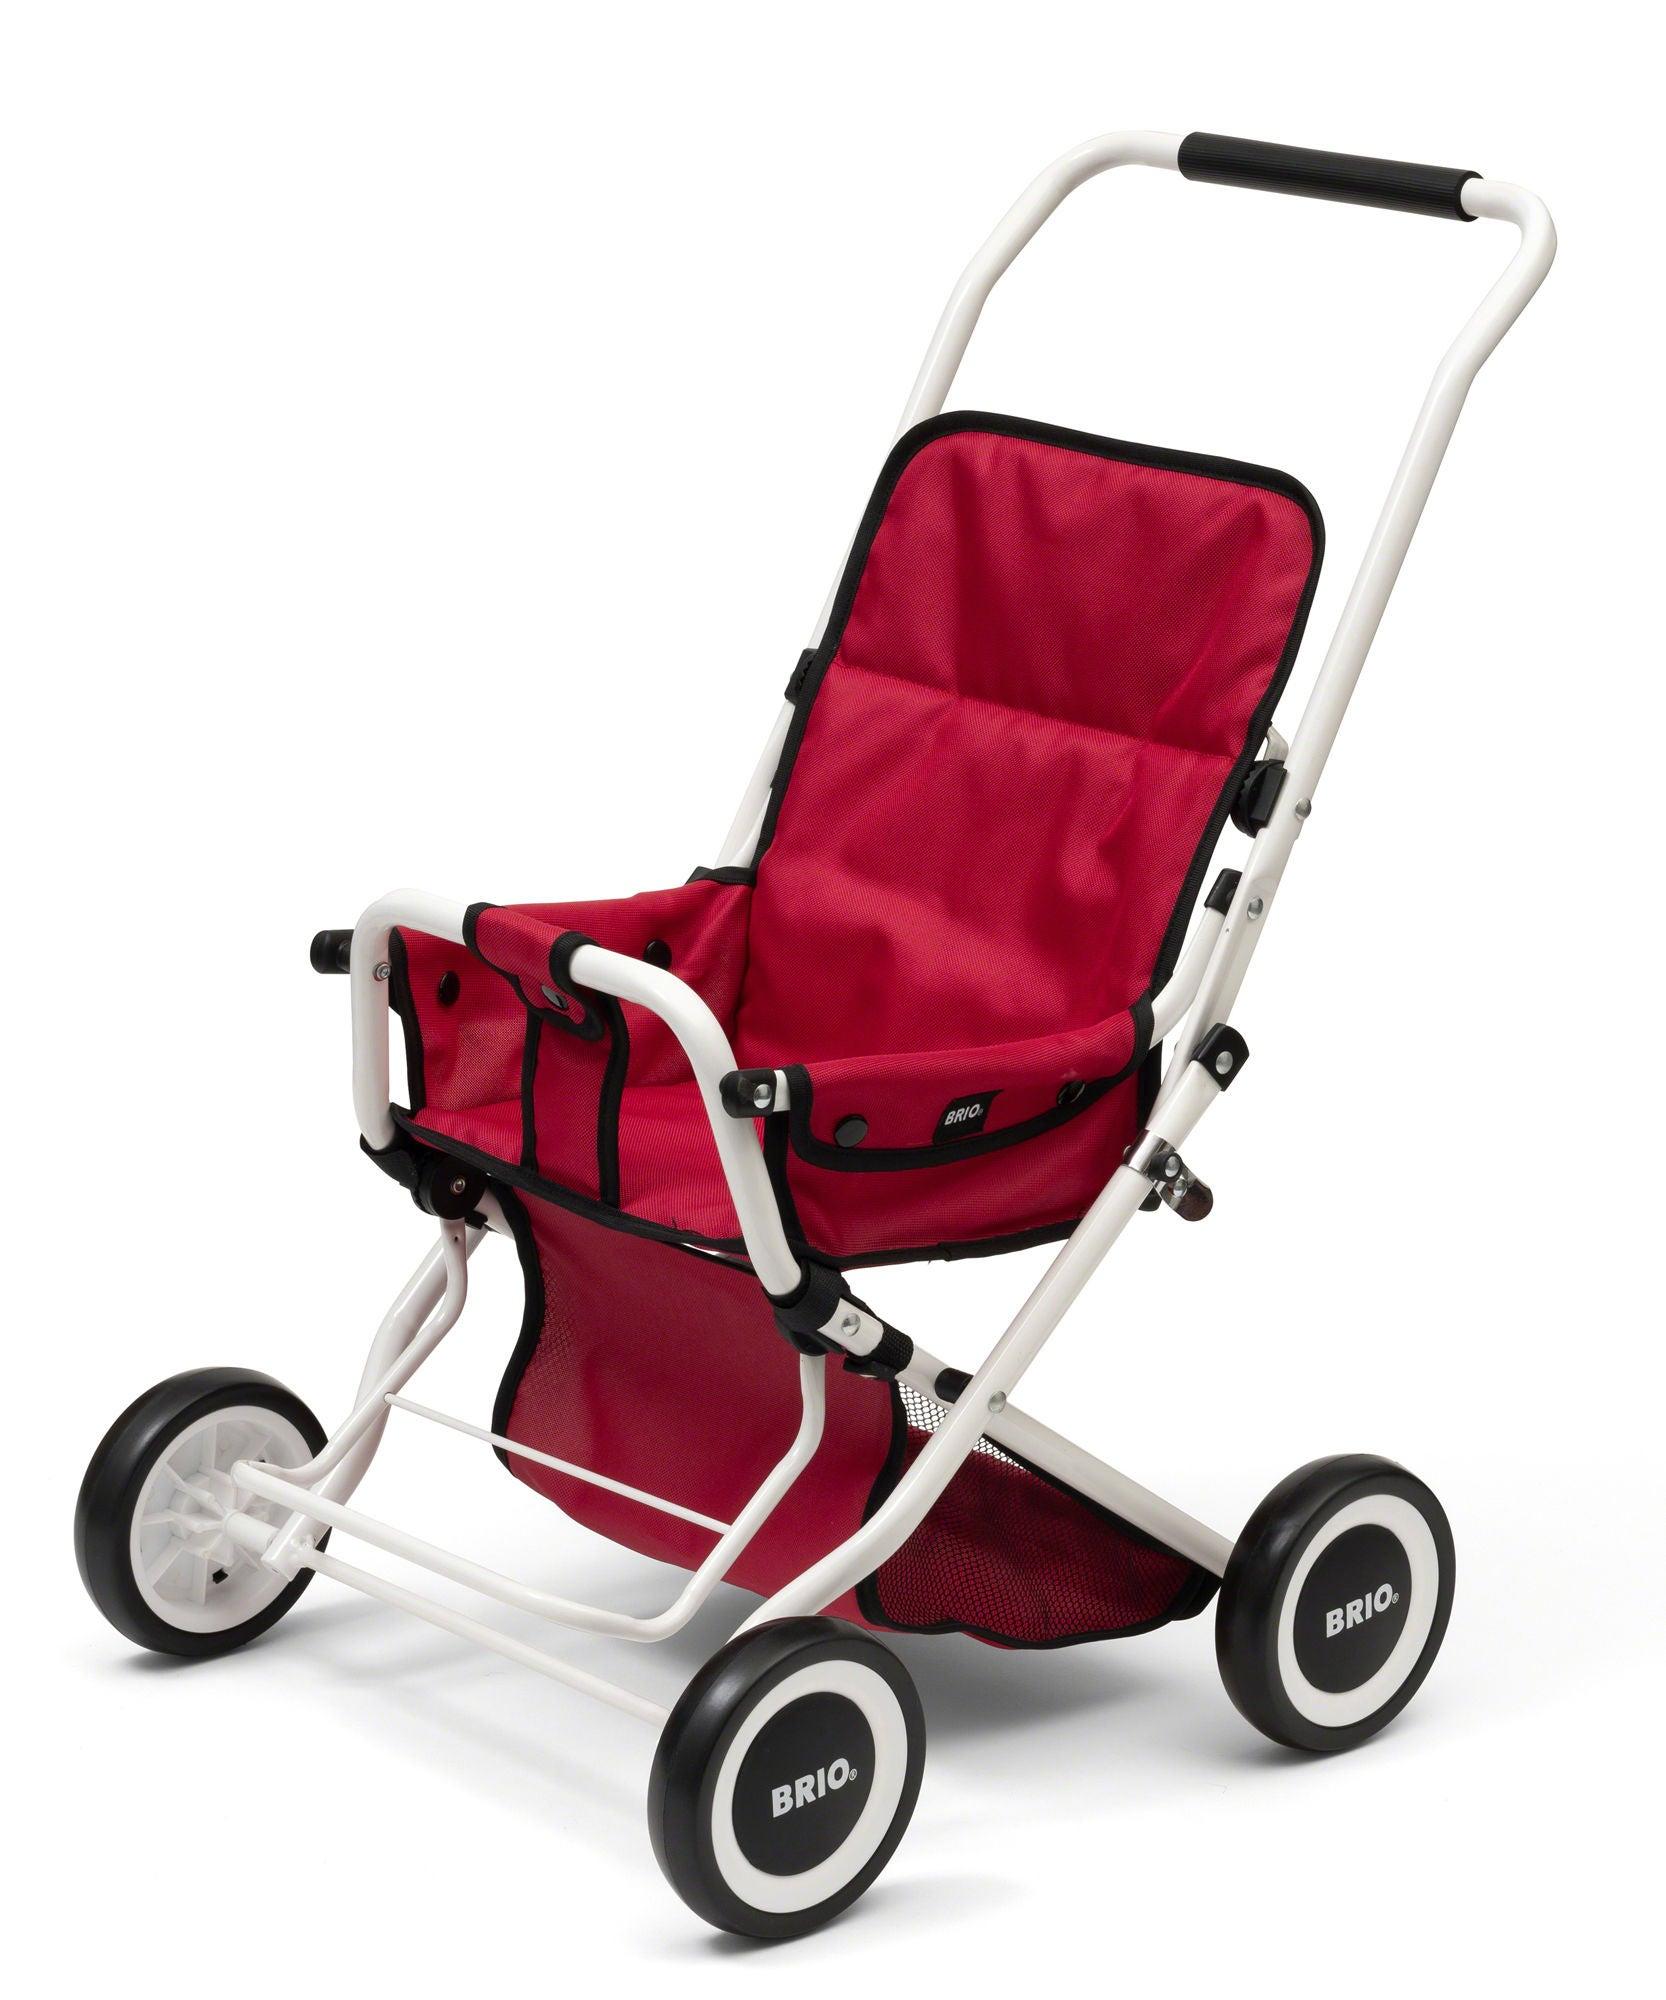 BRIO 24905000 Sitty Dockvagn, Röd